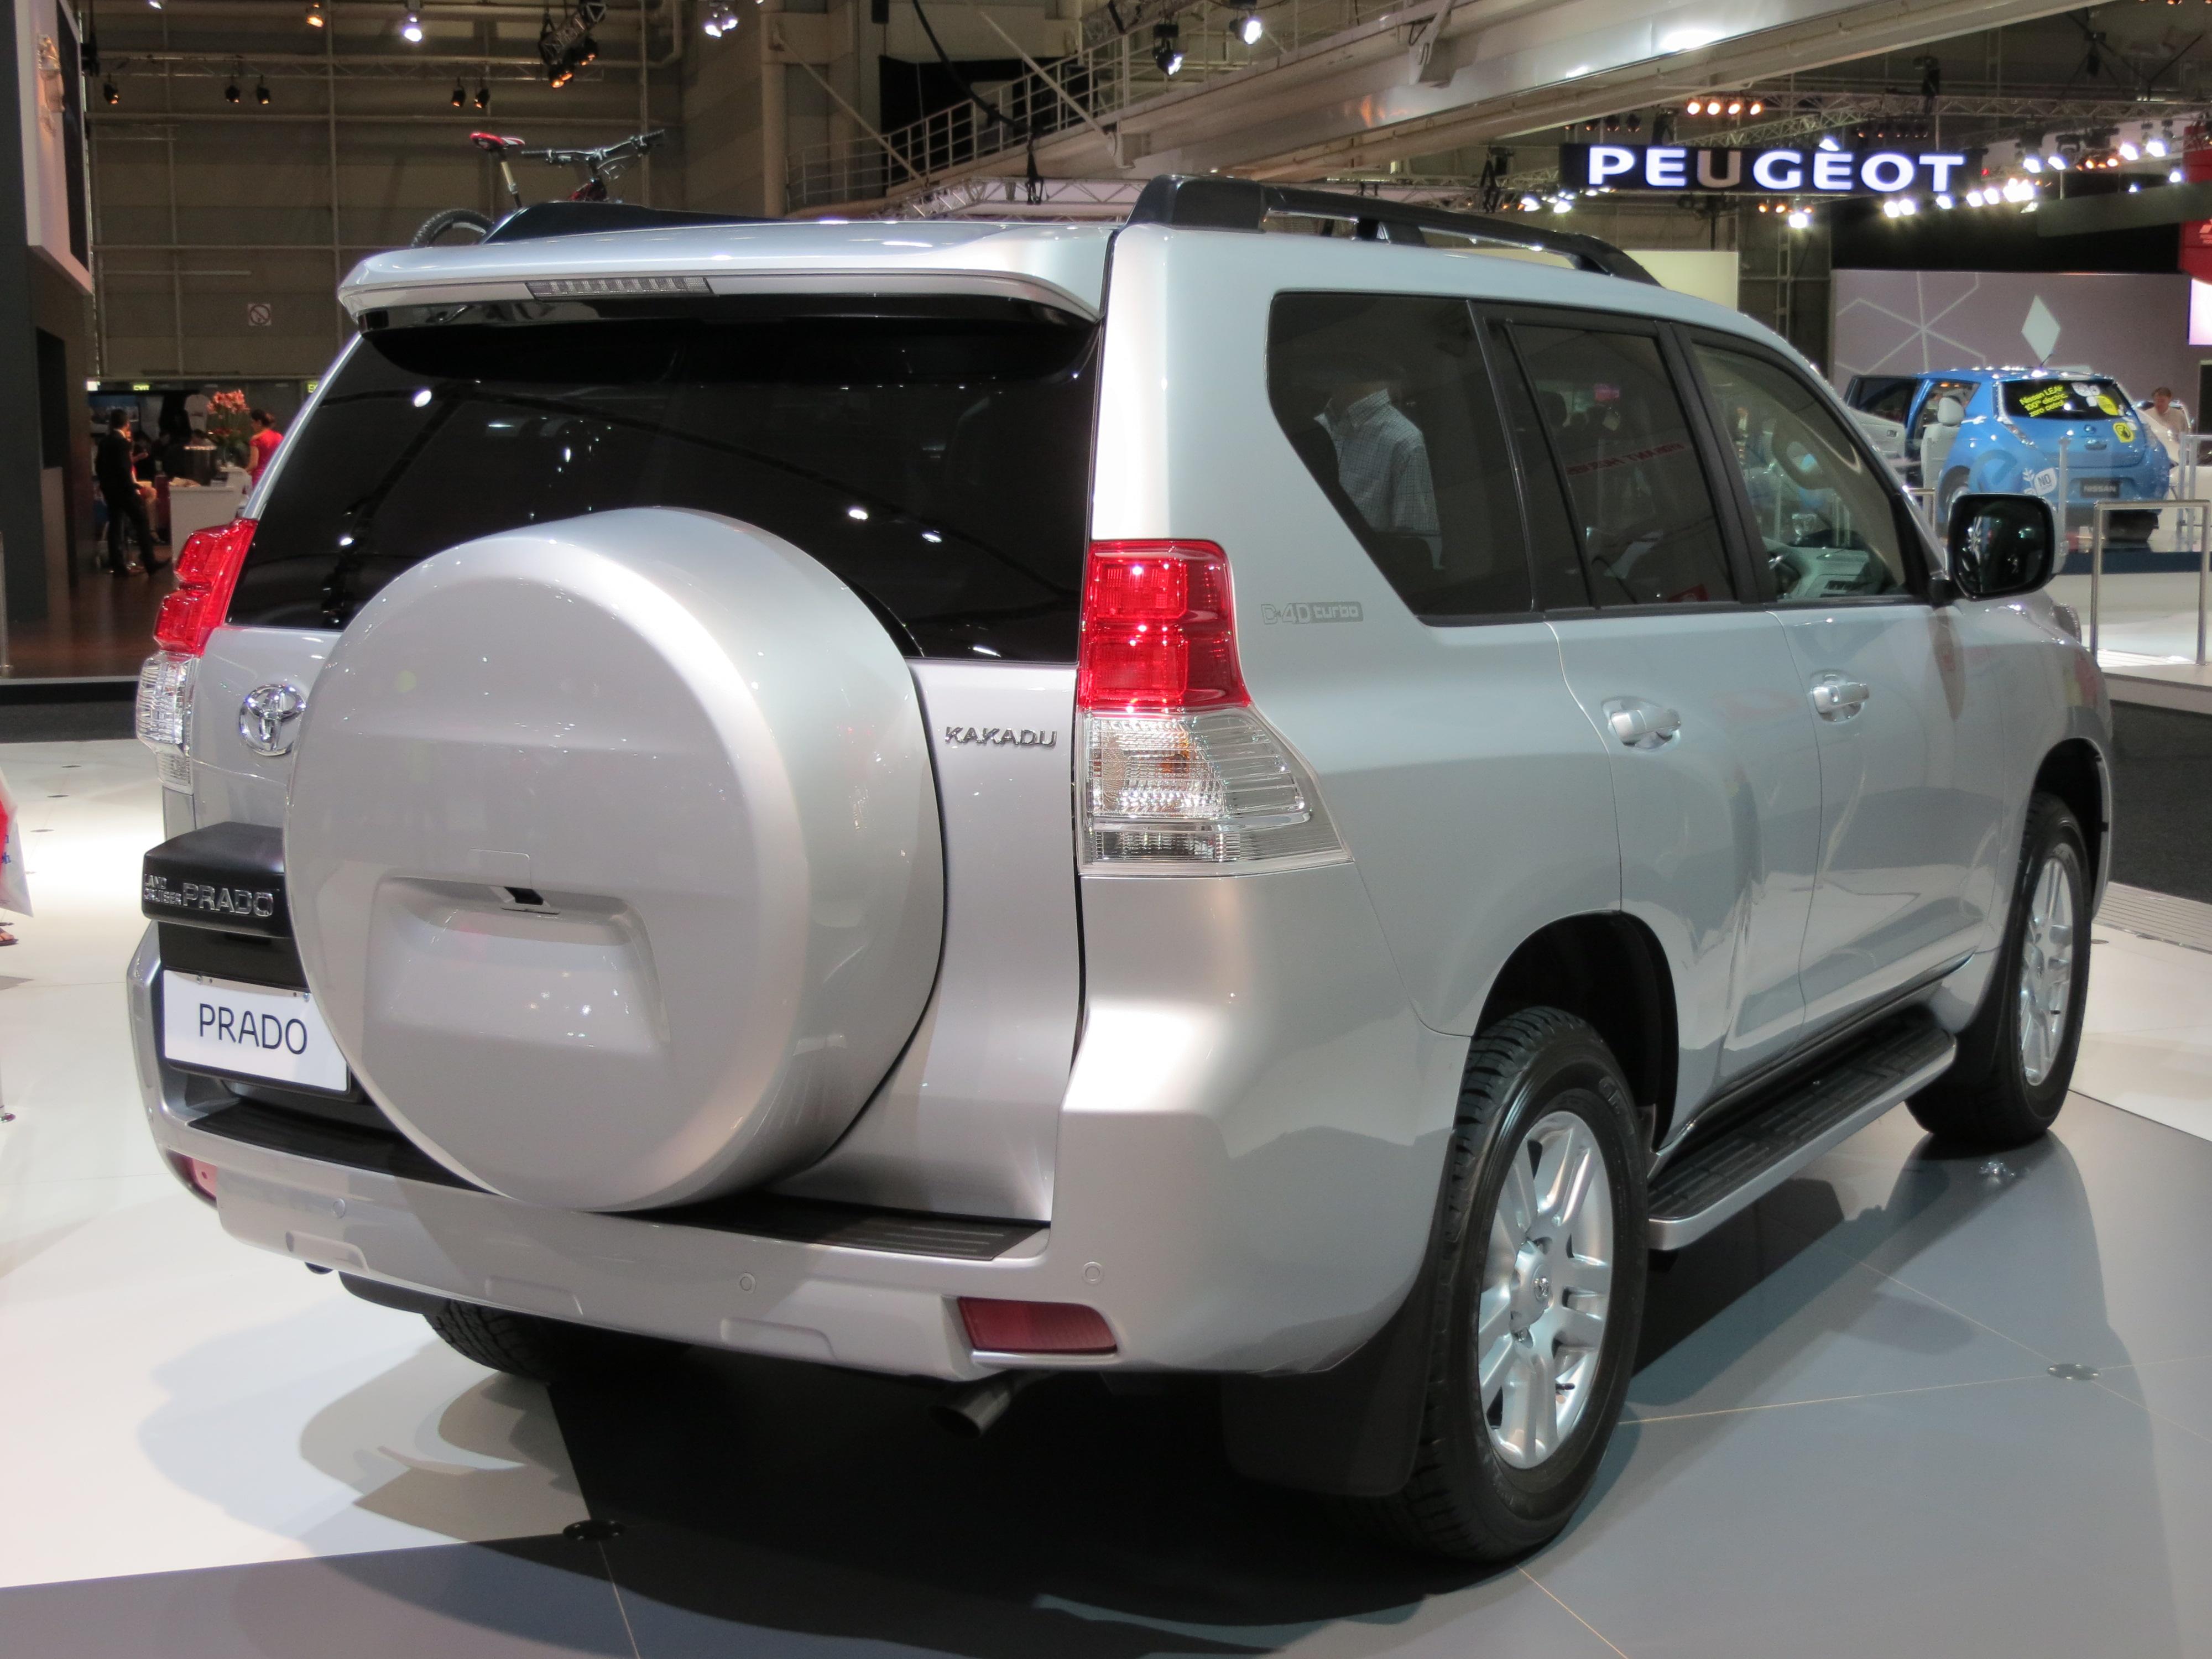 Toyota Land Cruiser Prado Wikipedia Colorado 3 5l Engine Parts Diagram Kakadu Kdj150r Pre Facelift Australia